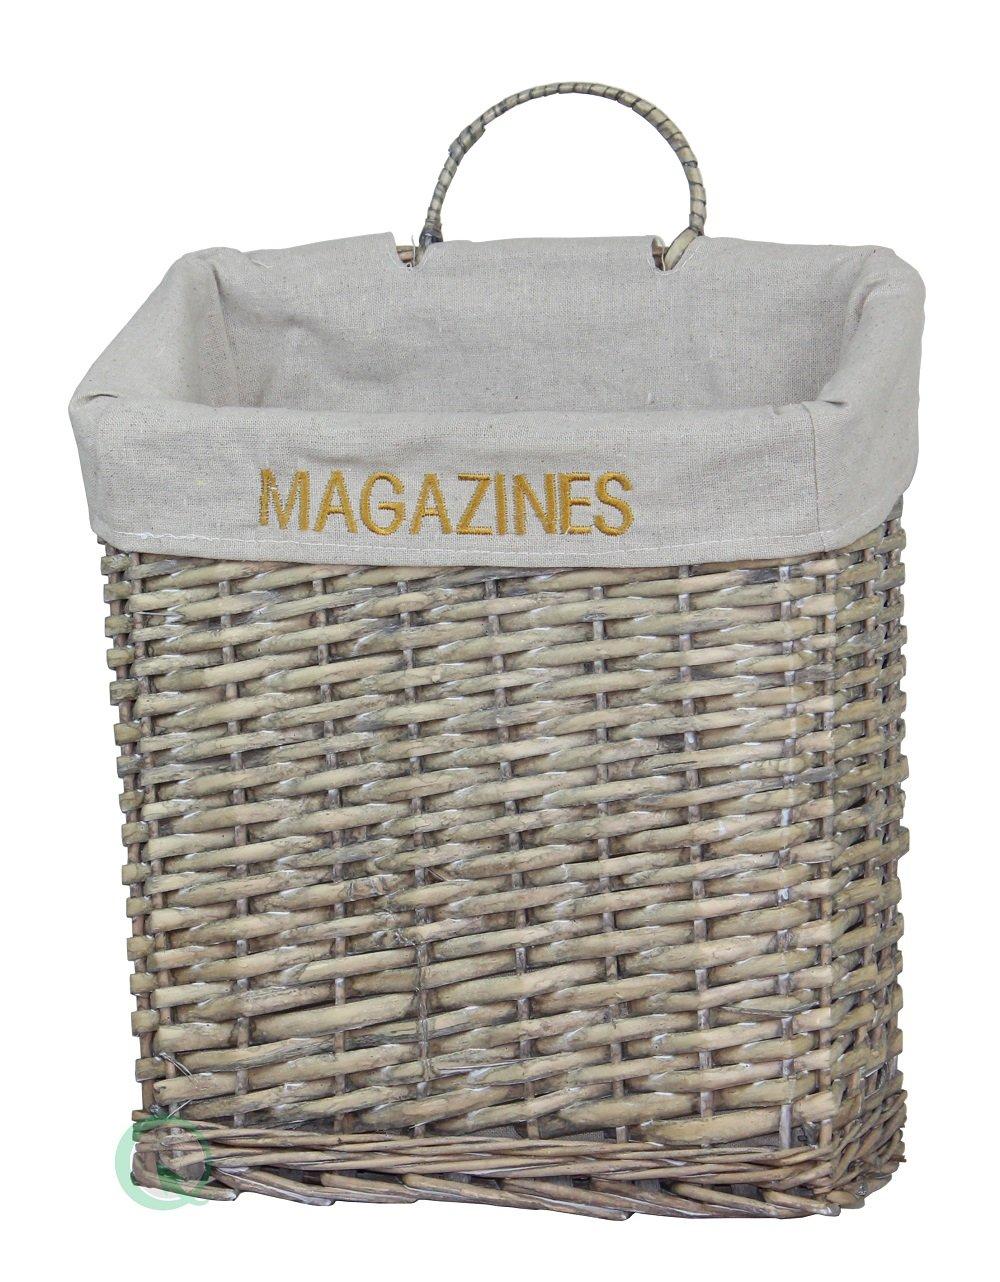 Vintiquewise(TM) Vintage Magazine Basket Quickway Imports QI003072